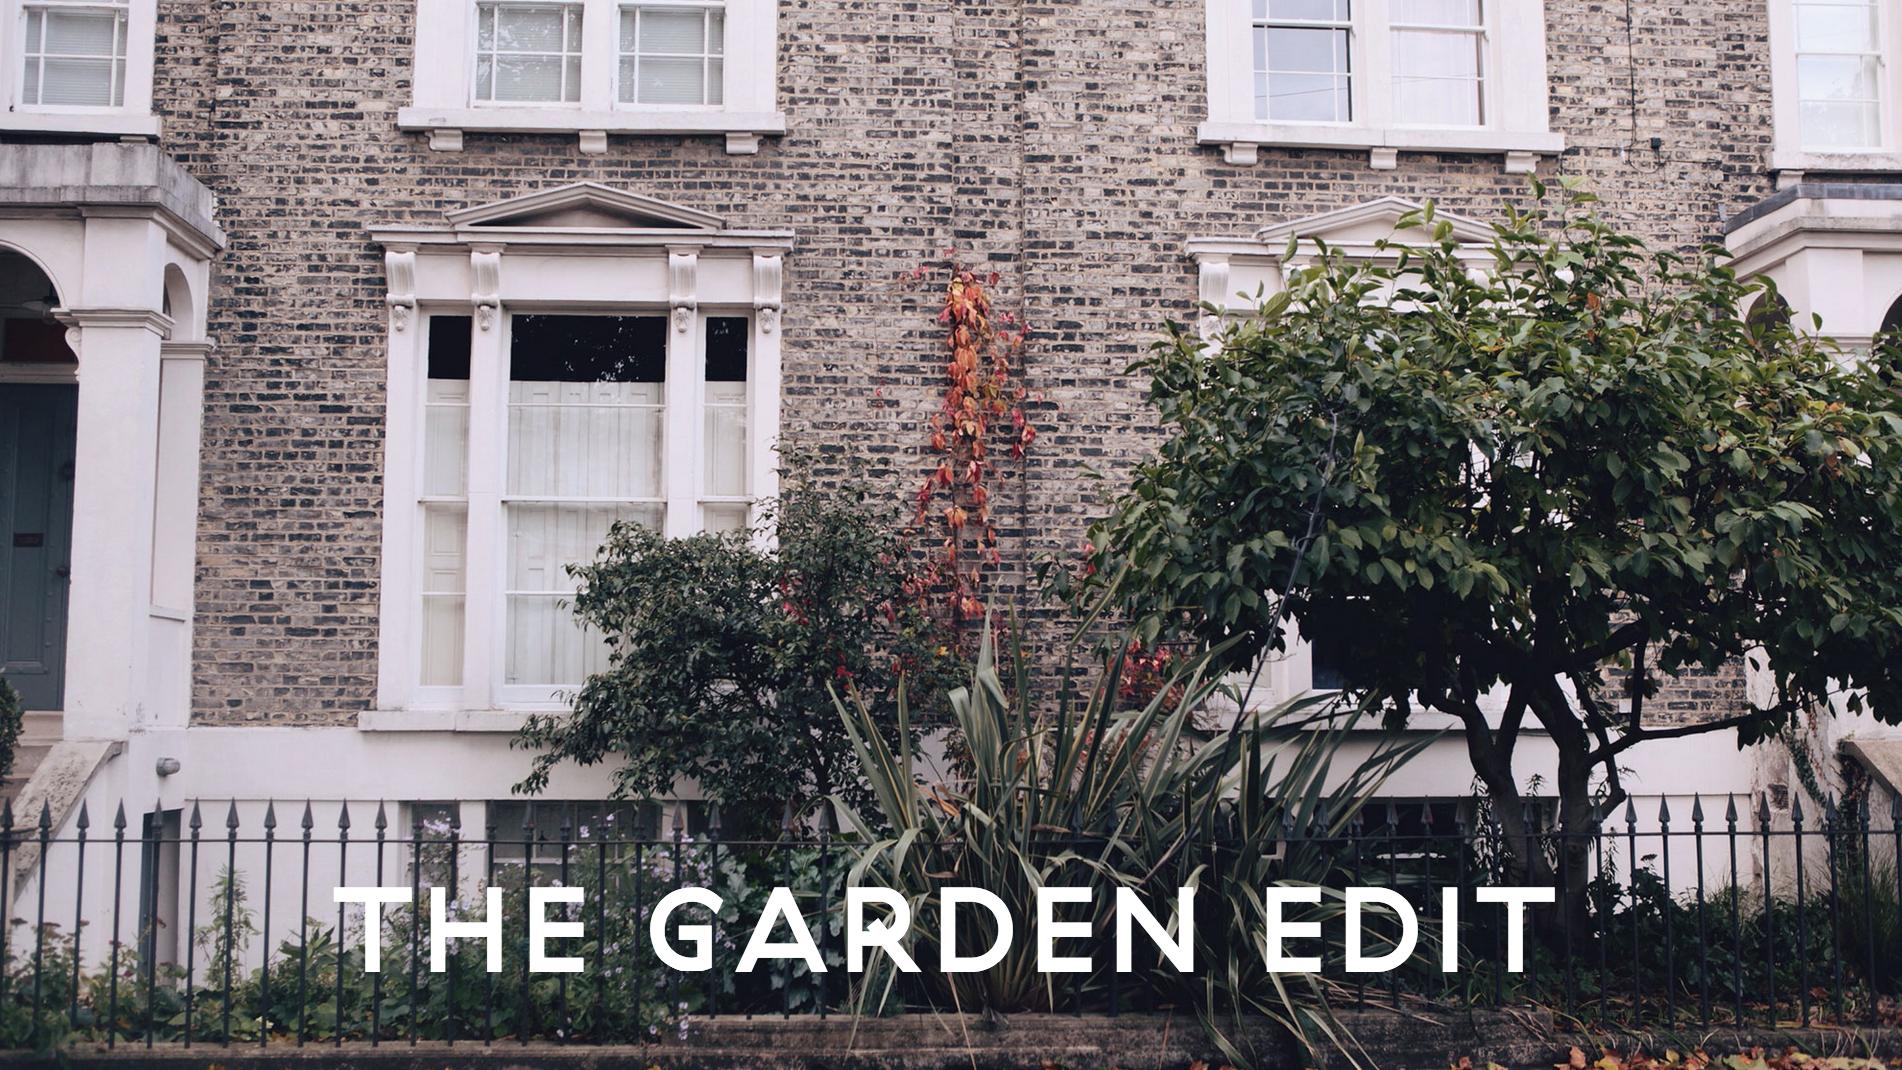 The Garden Edit